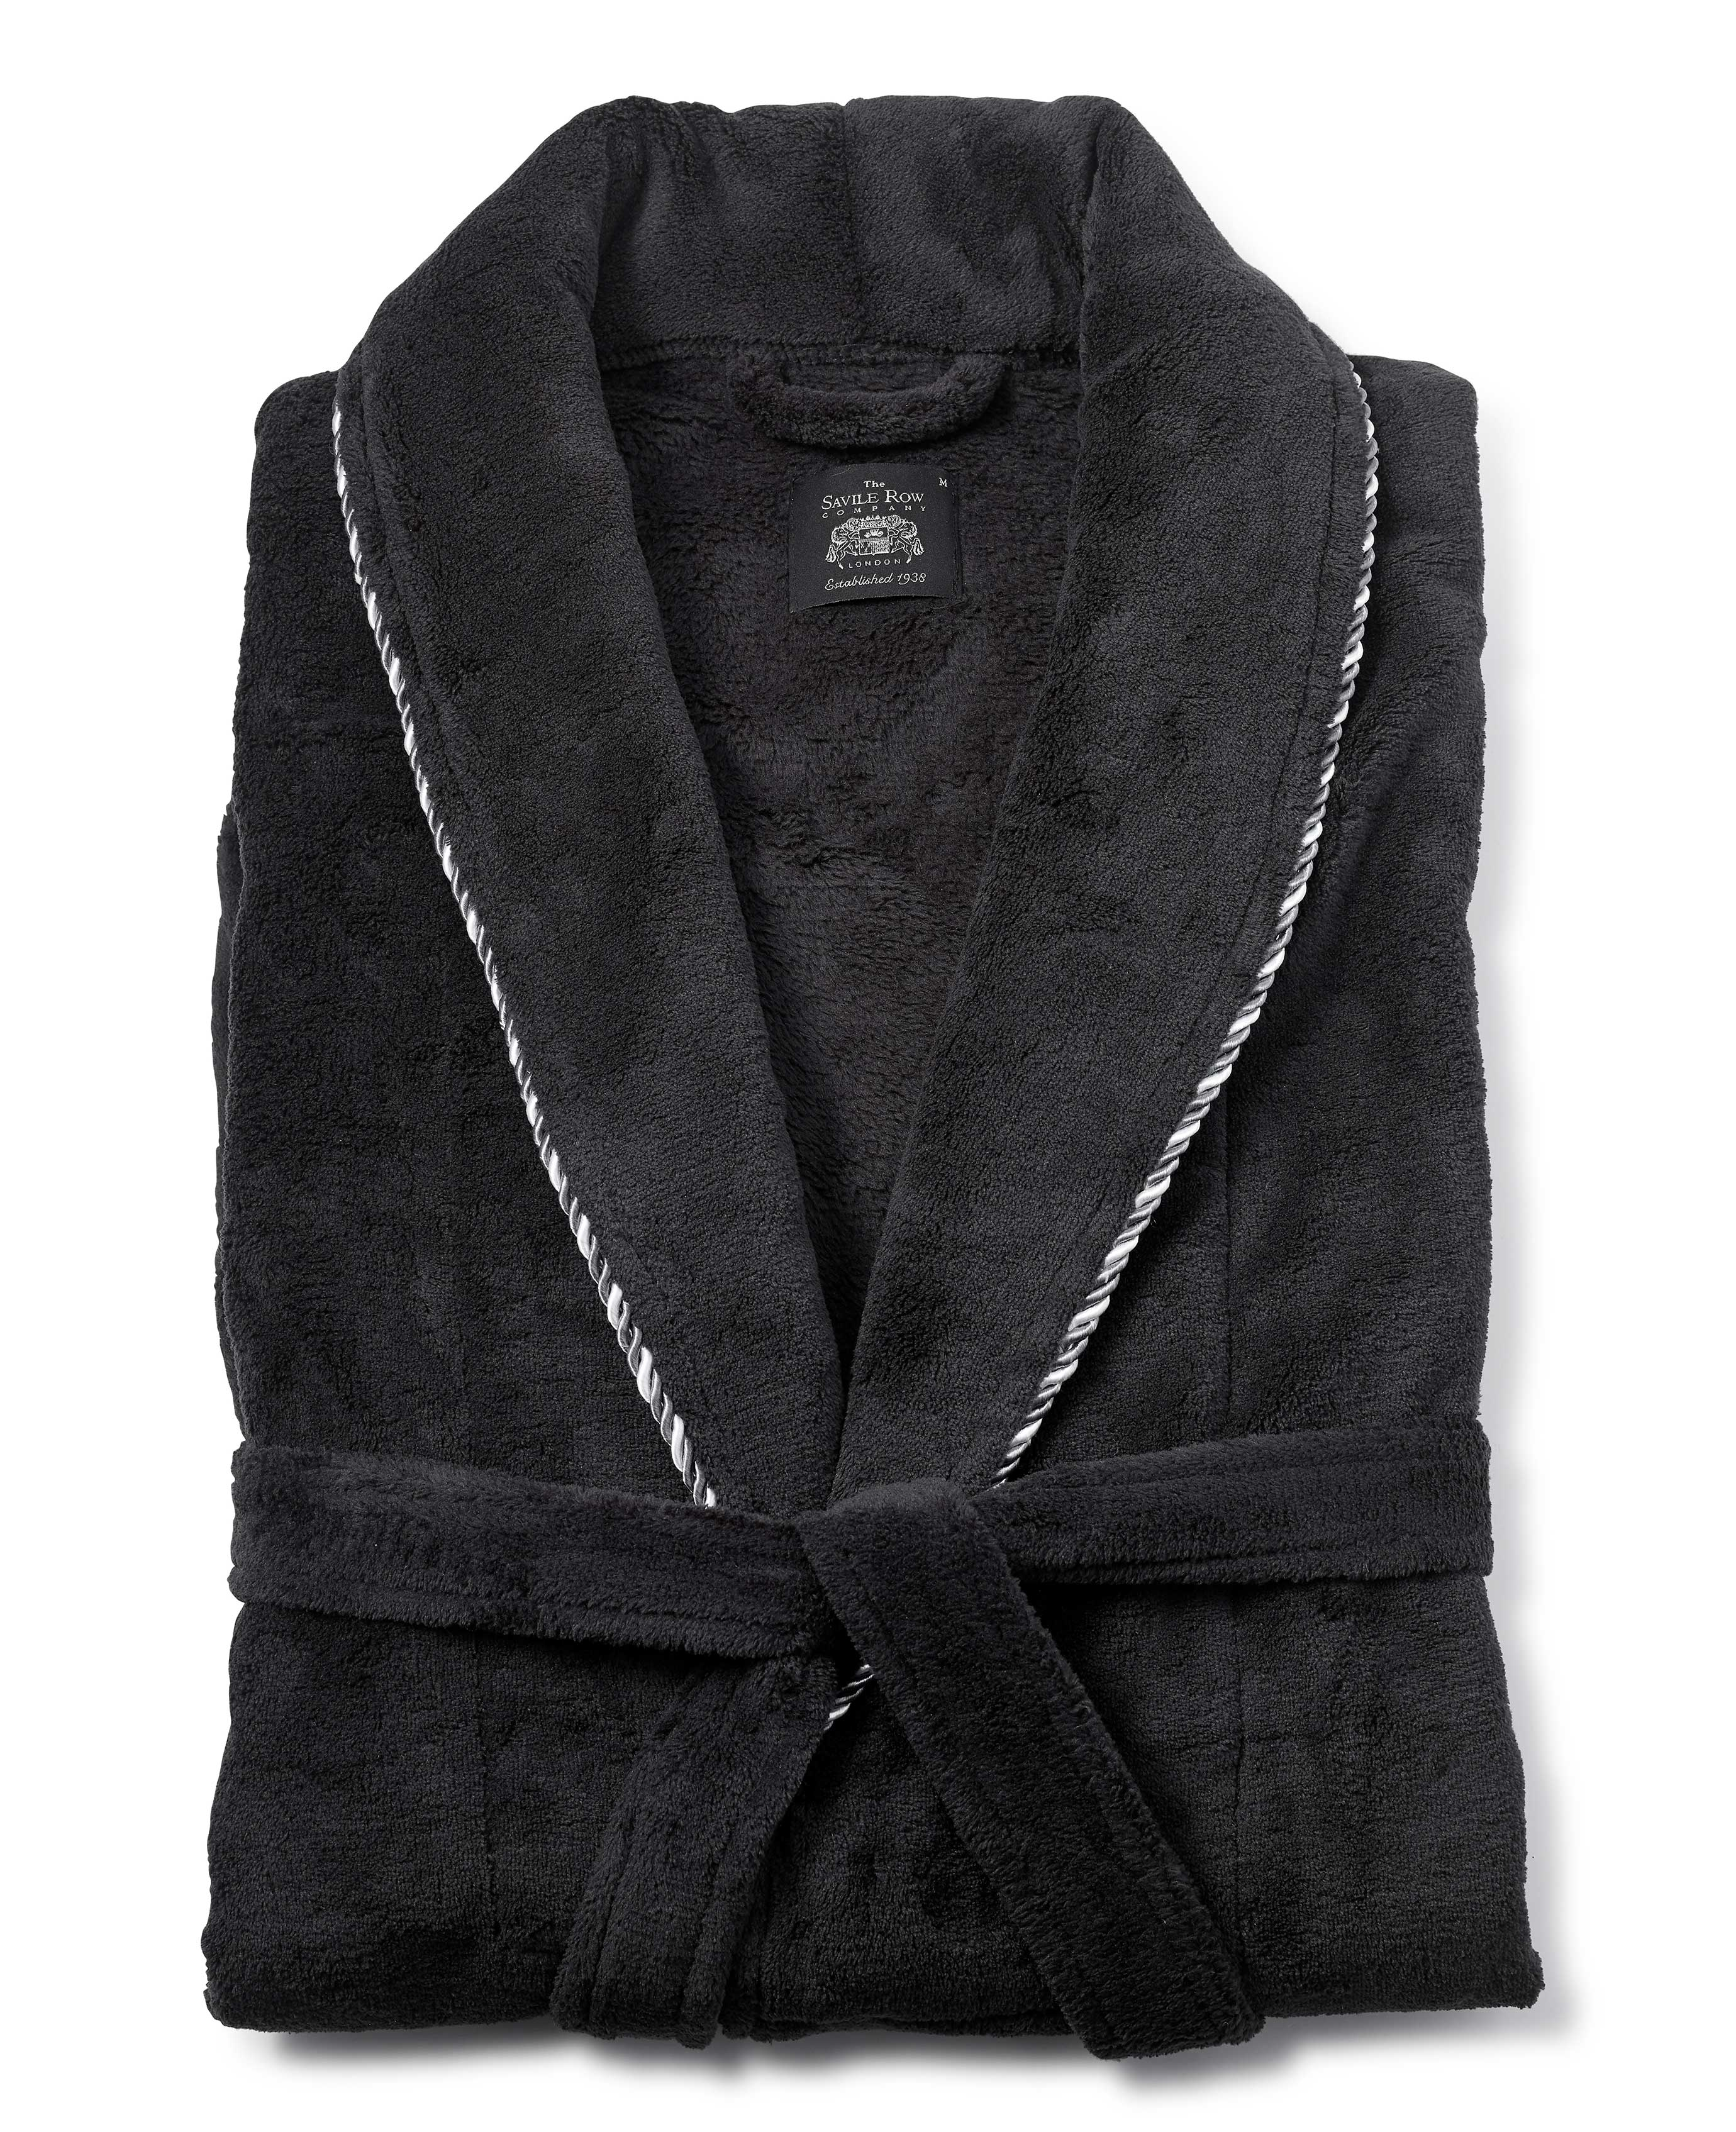 Savile Row Men\'s Black Fleece Rope Edge Dressing Gown | eBay